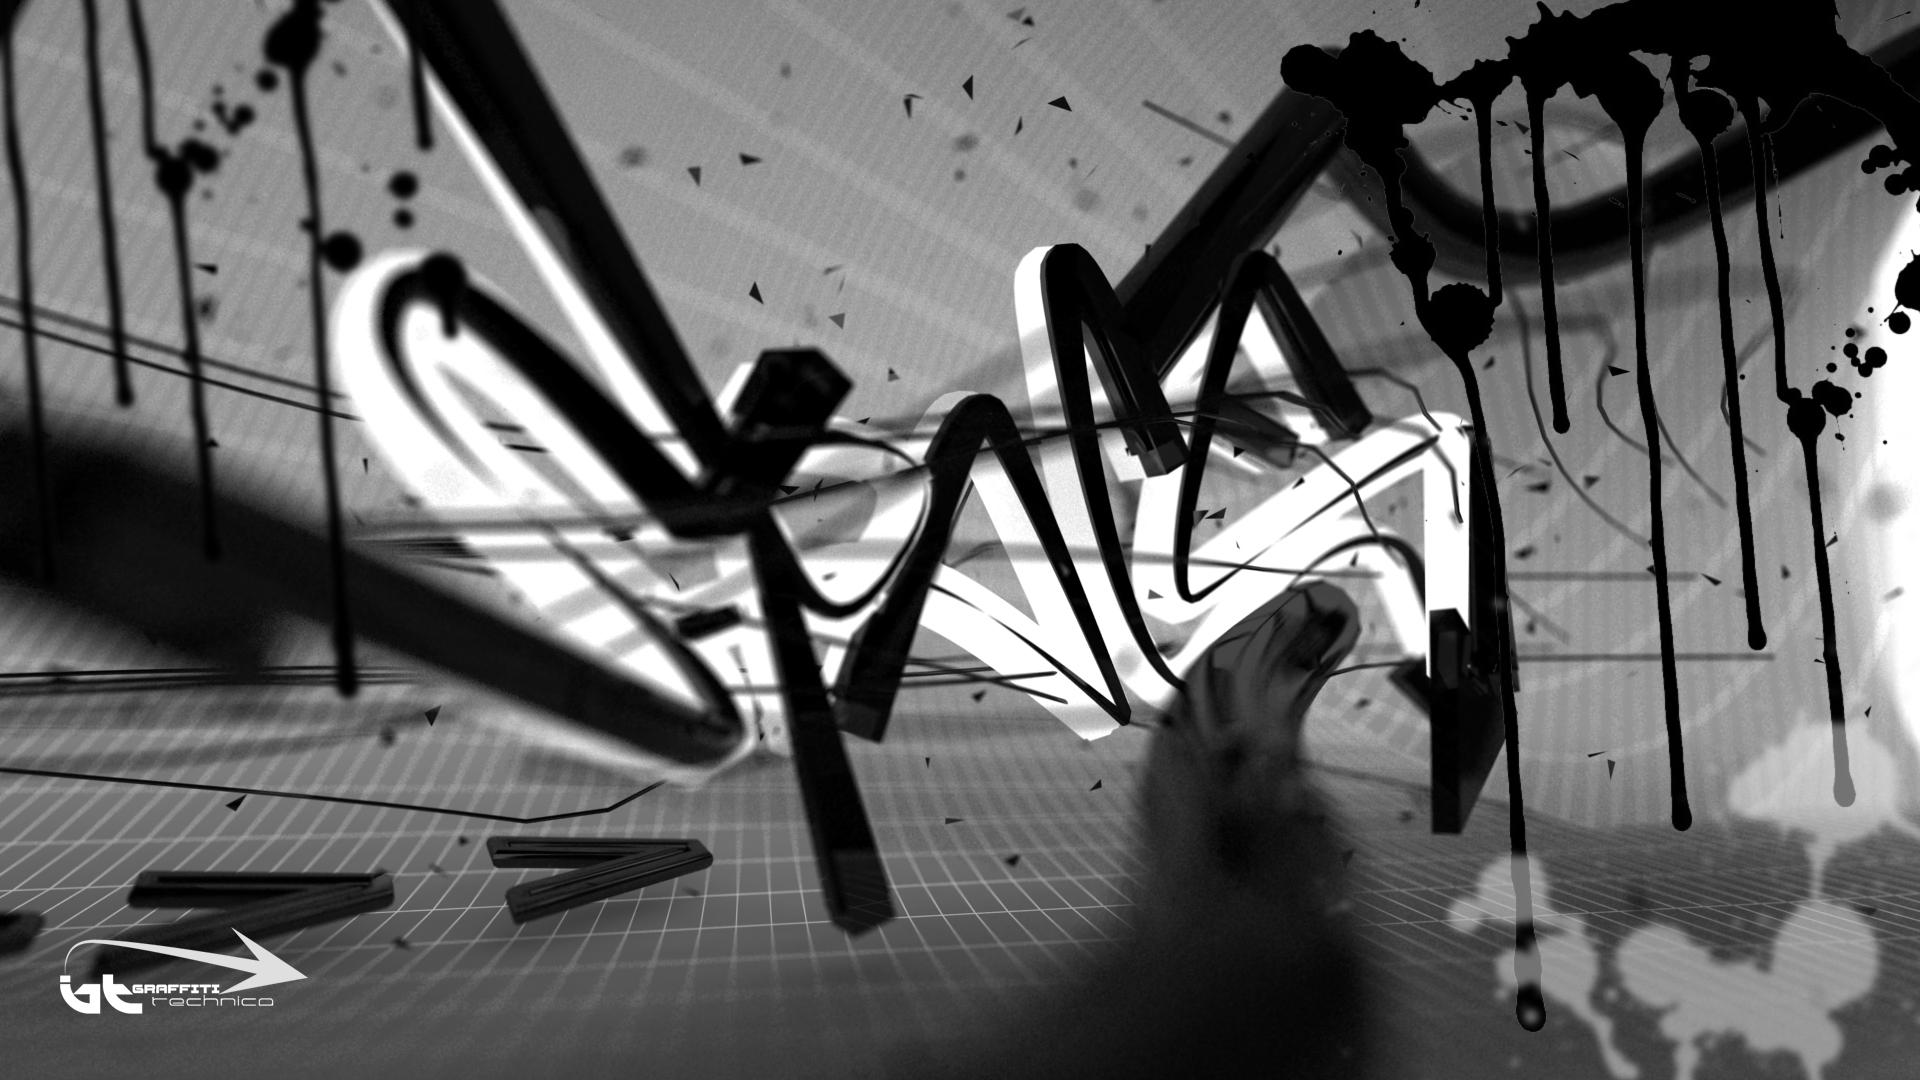 3d Graffiti Wallpaper Space Graffiti Technica